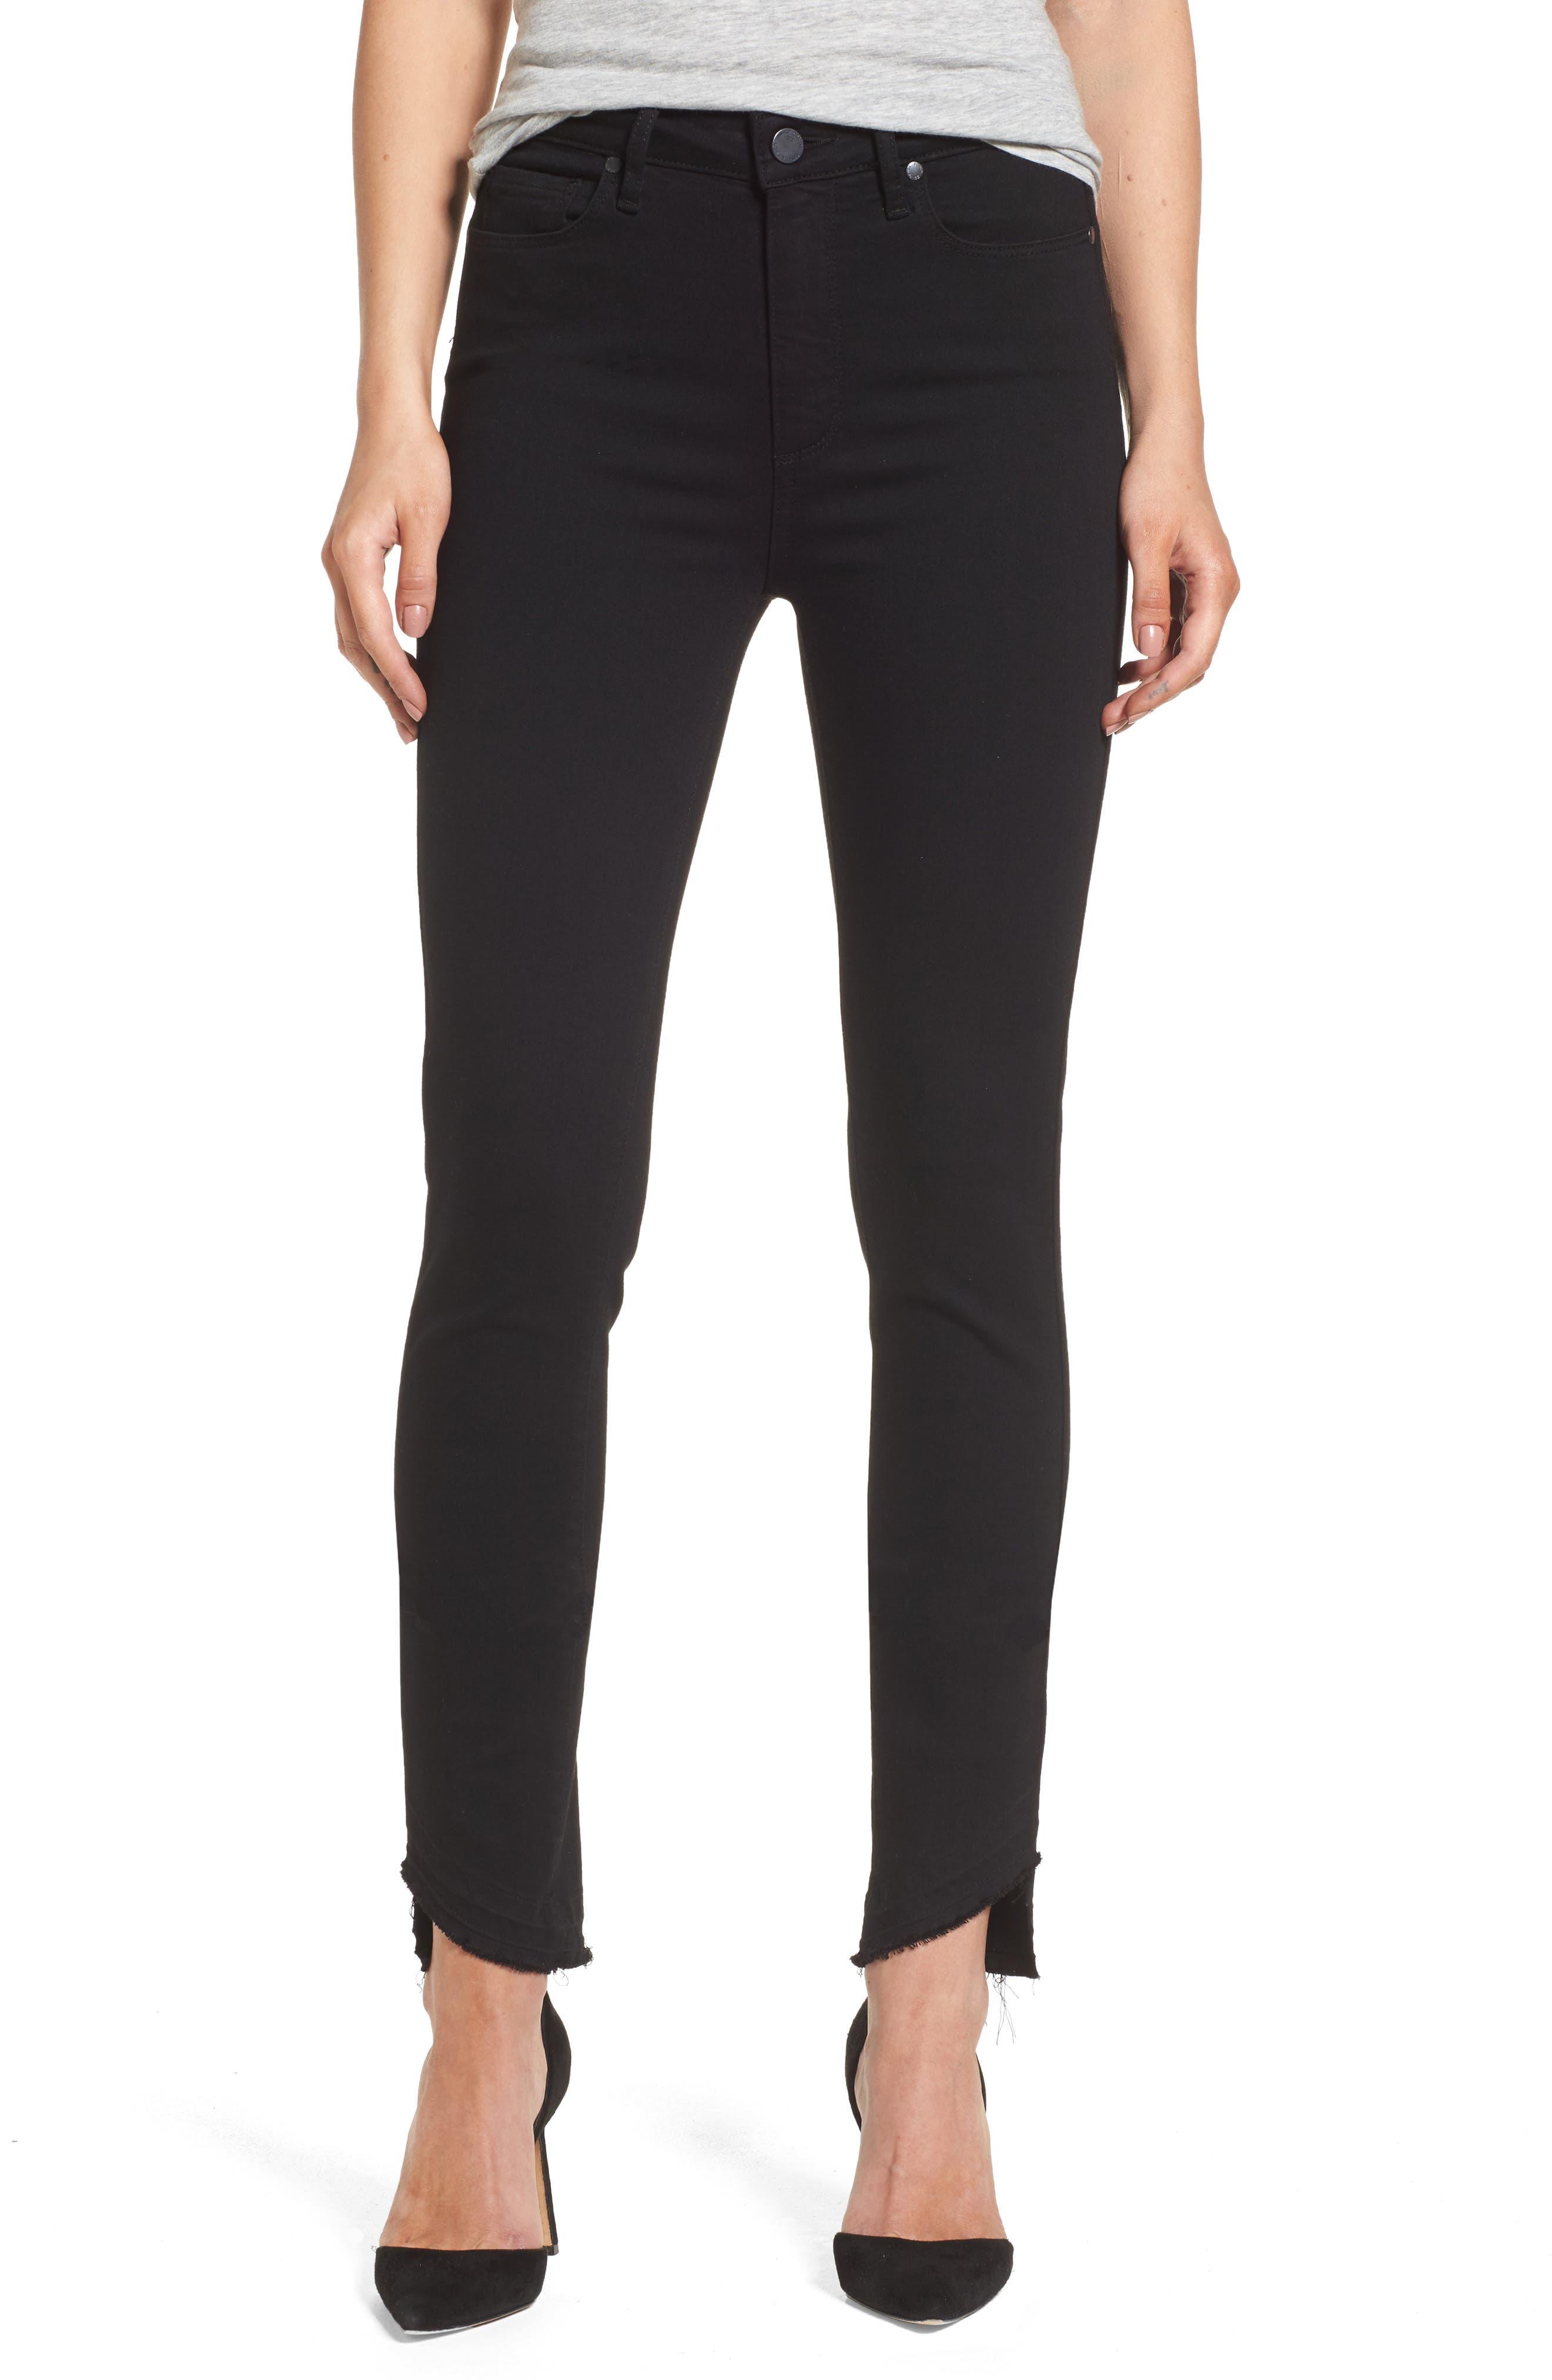 Transcend Hoxton High Waist Undone Hem Skinny Jeans,                         Main,                         color, Black Shadow